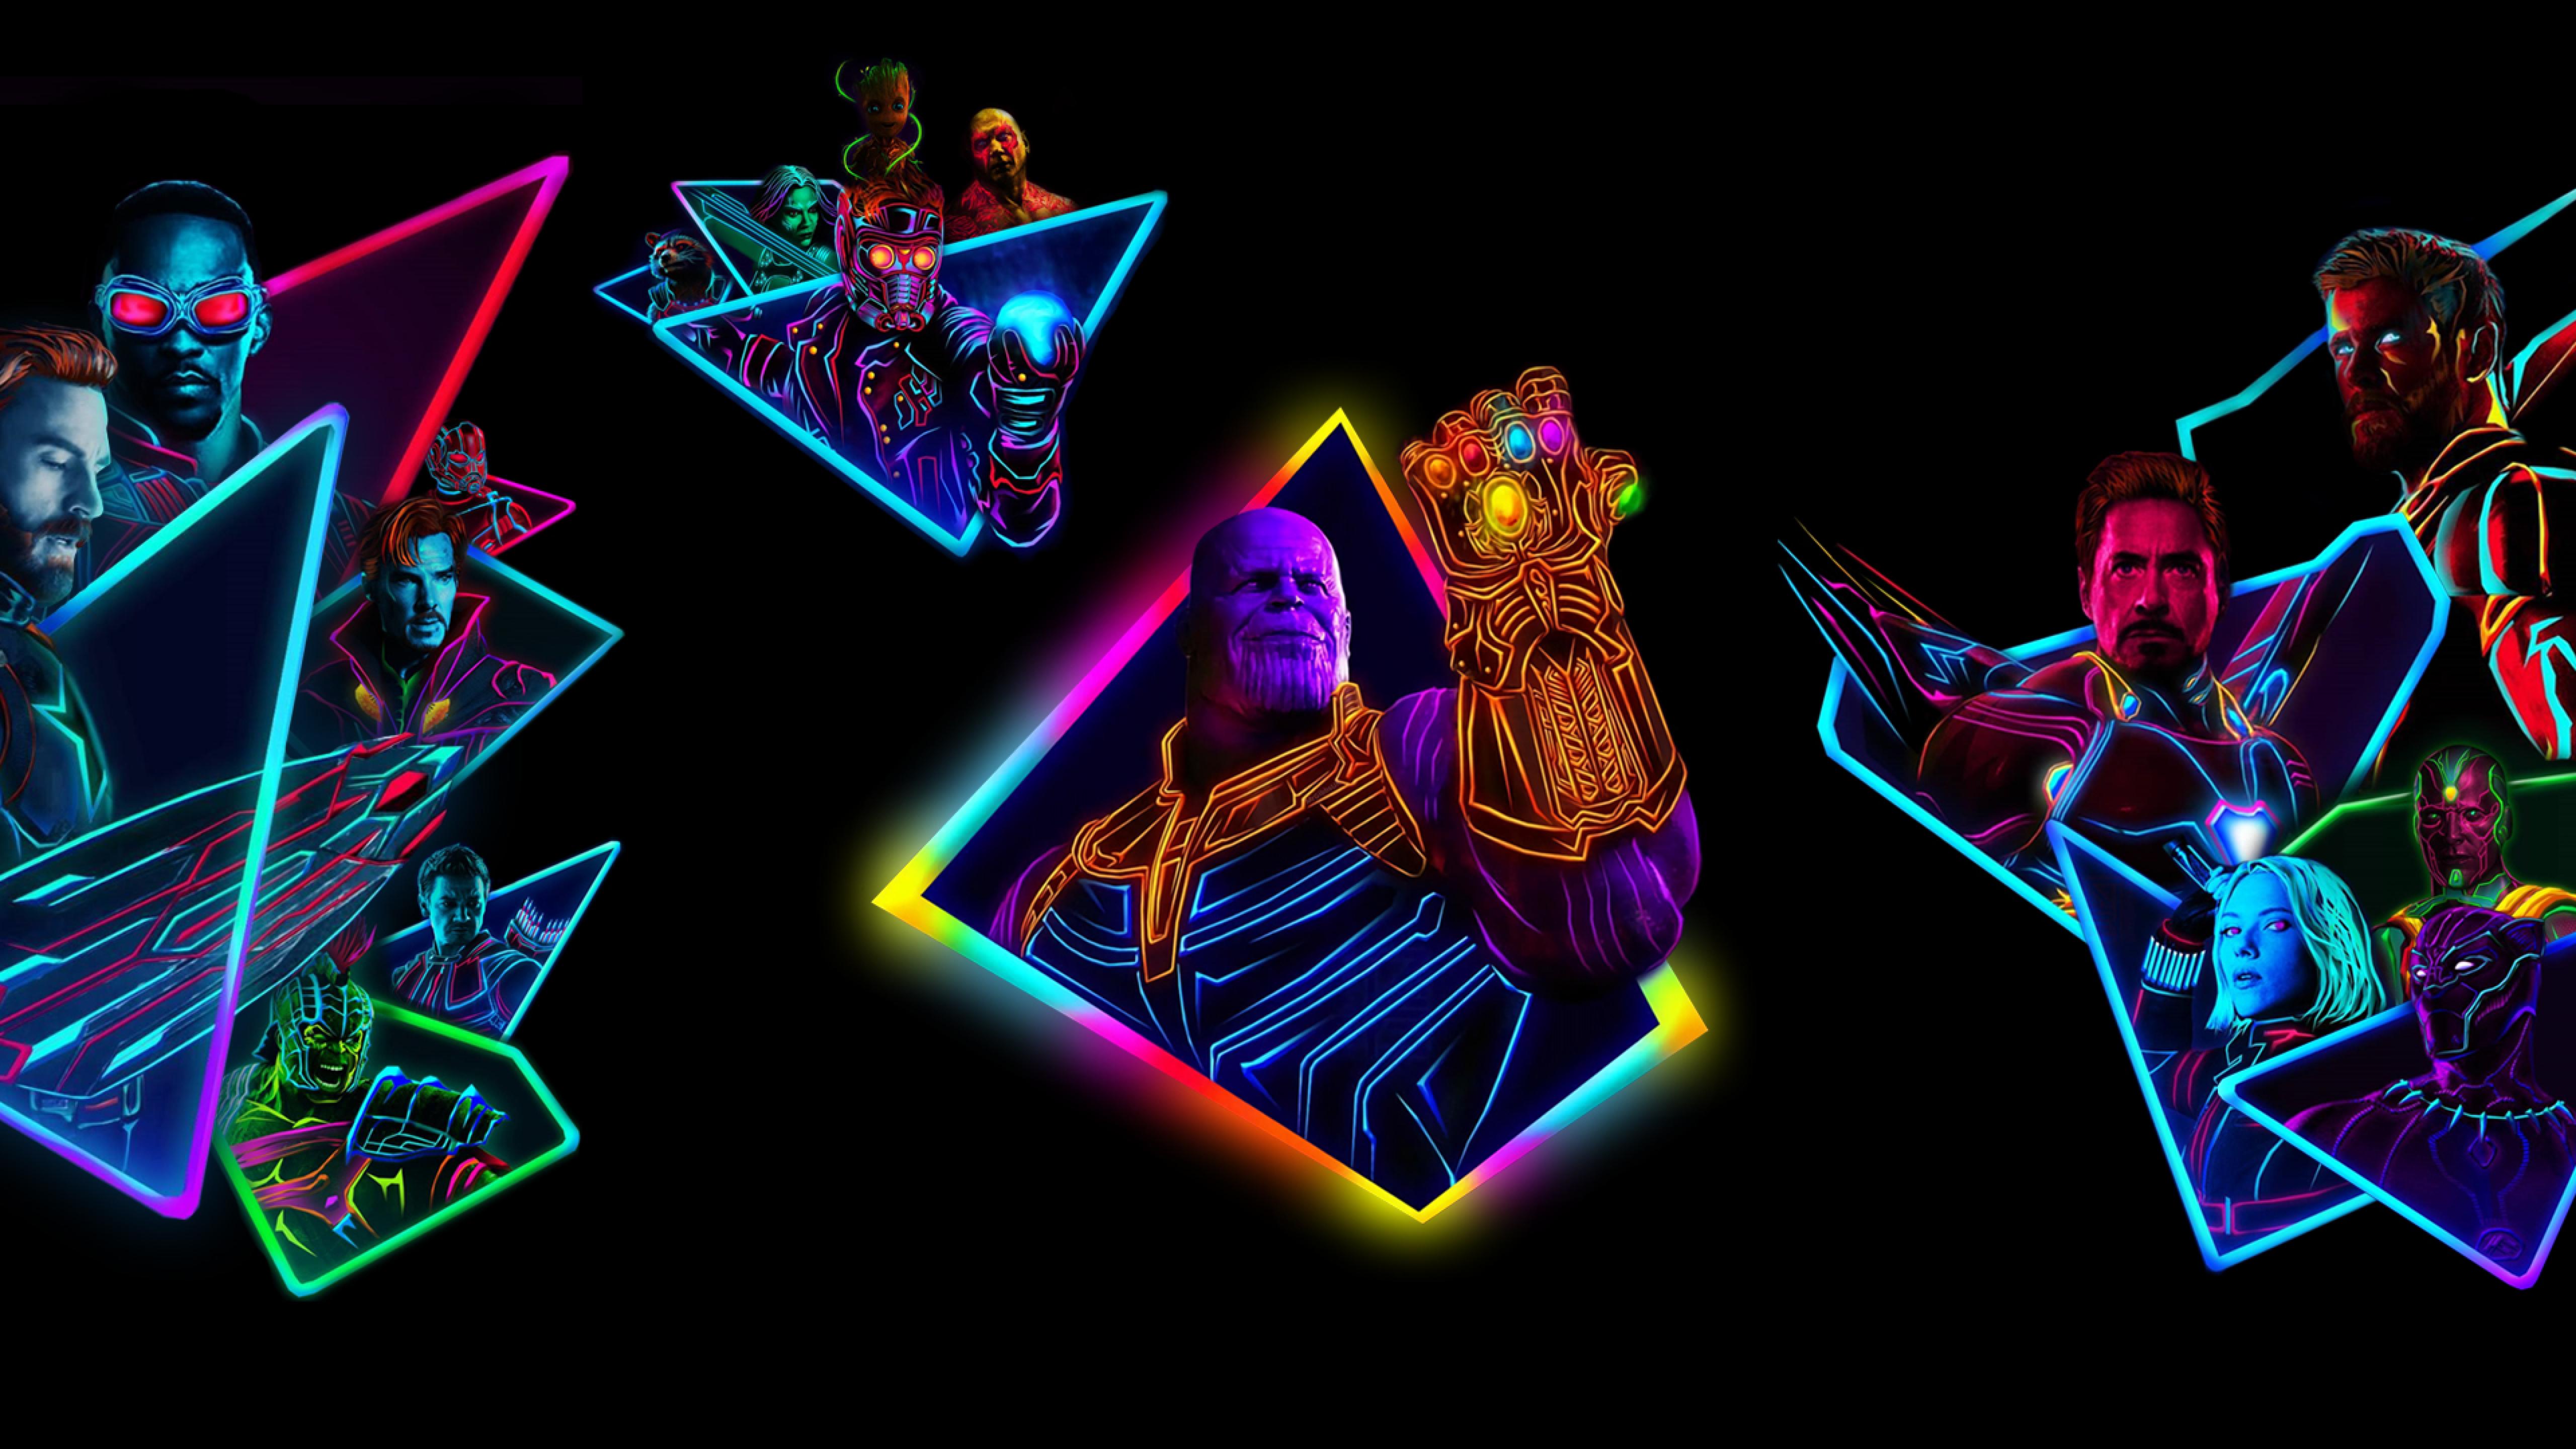 Avengers Infinity War 80s Neon Style Art Full HD Wallpaper